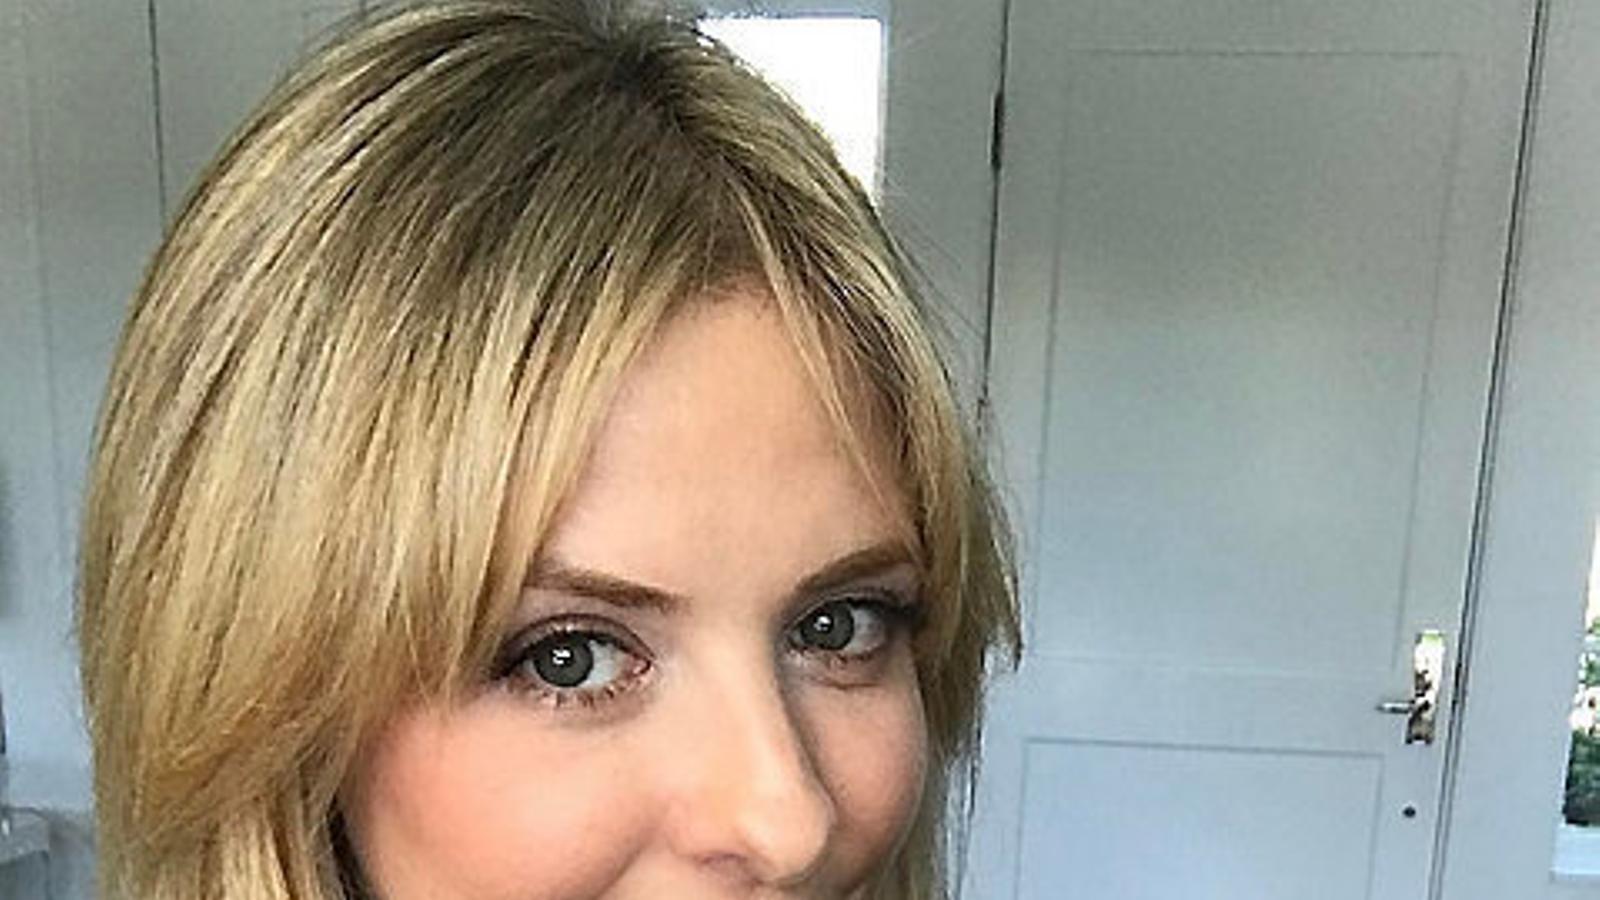 Sarah M. Gellar homenatja 'Buffy, cazavampiros' vint anys després